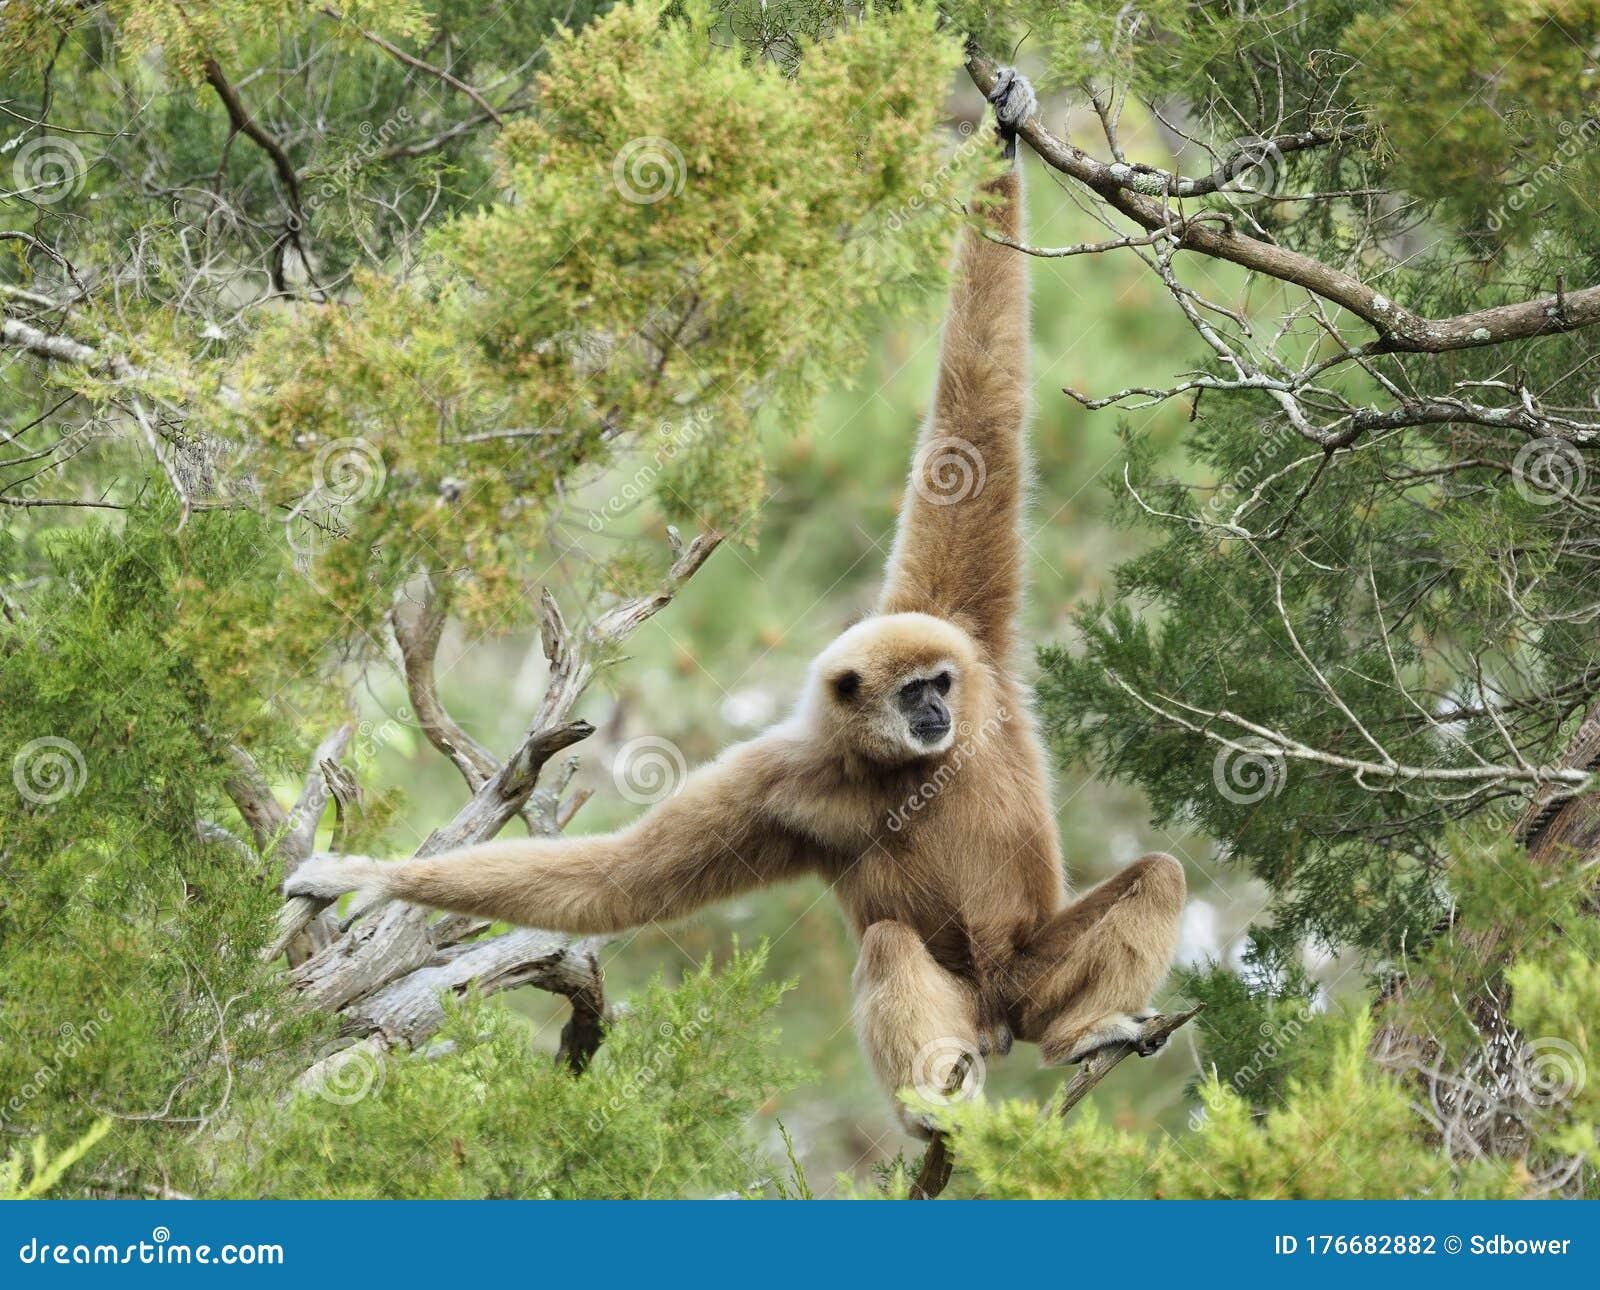 https://thumbs.dreamstime.com/z/mature-male-white-handed-gibbon-swinging-trees-beautiful-gibbonswinging-176682882.jpg